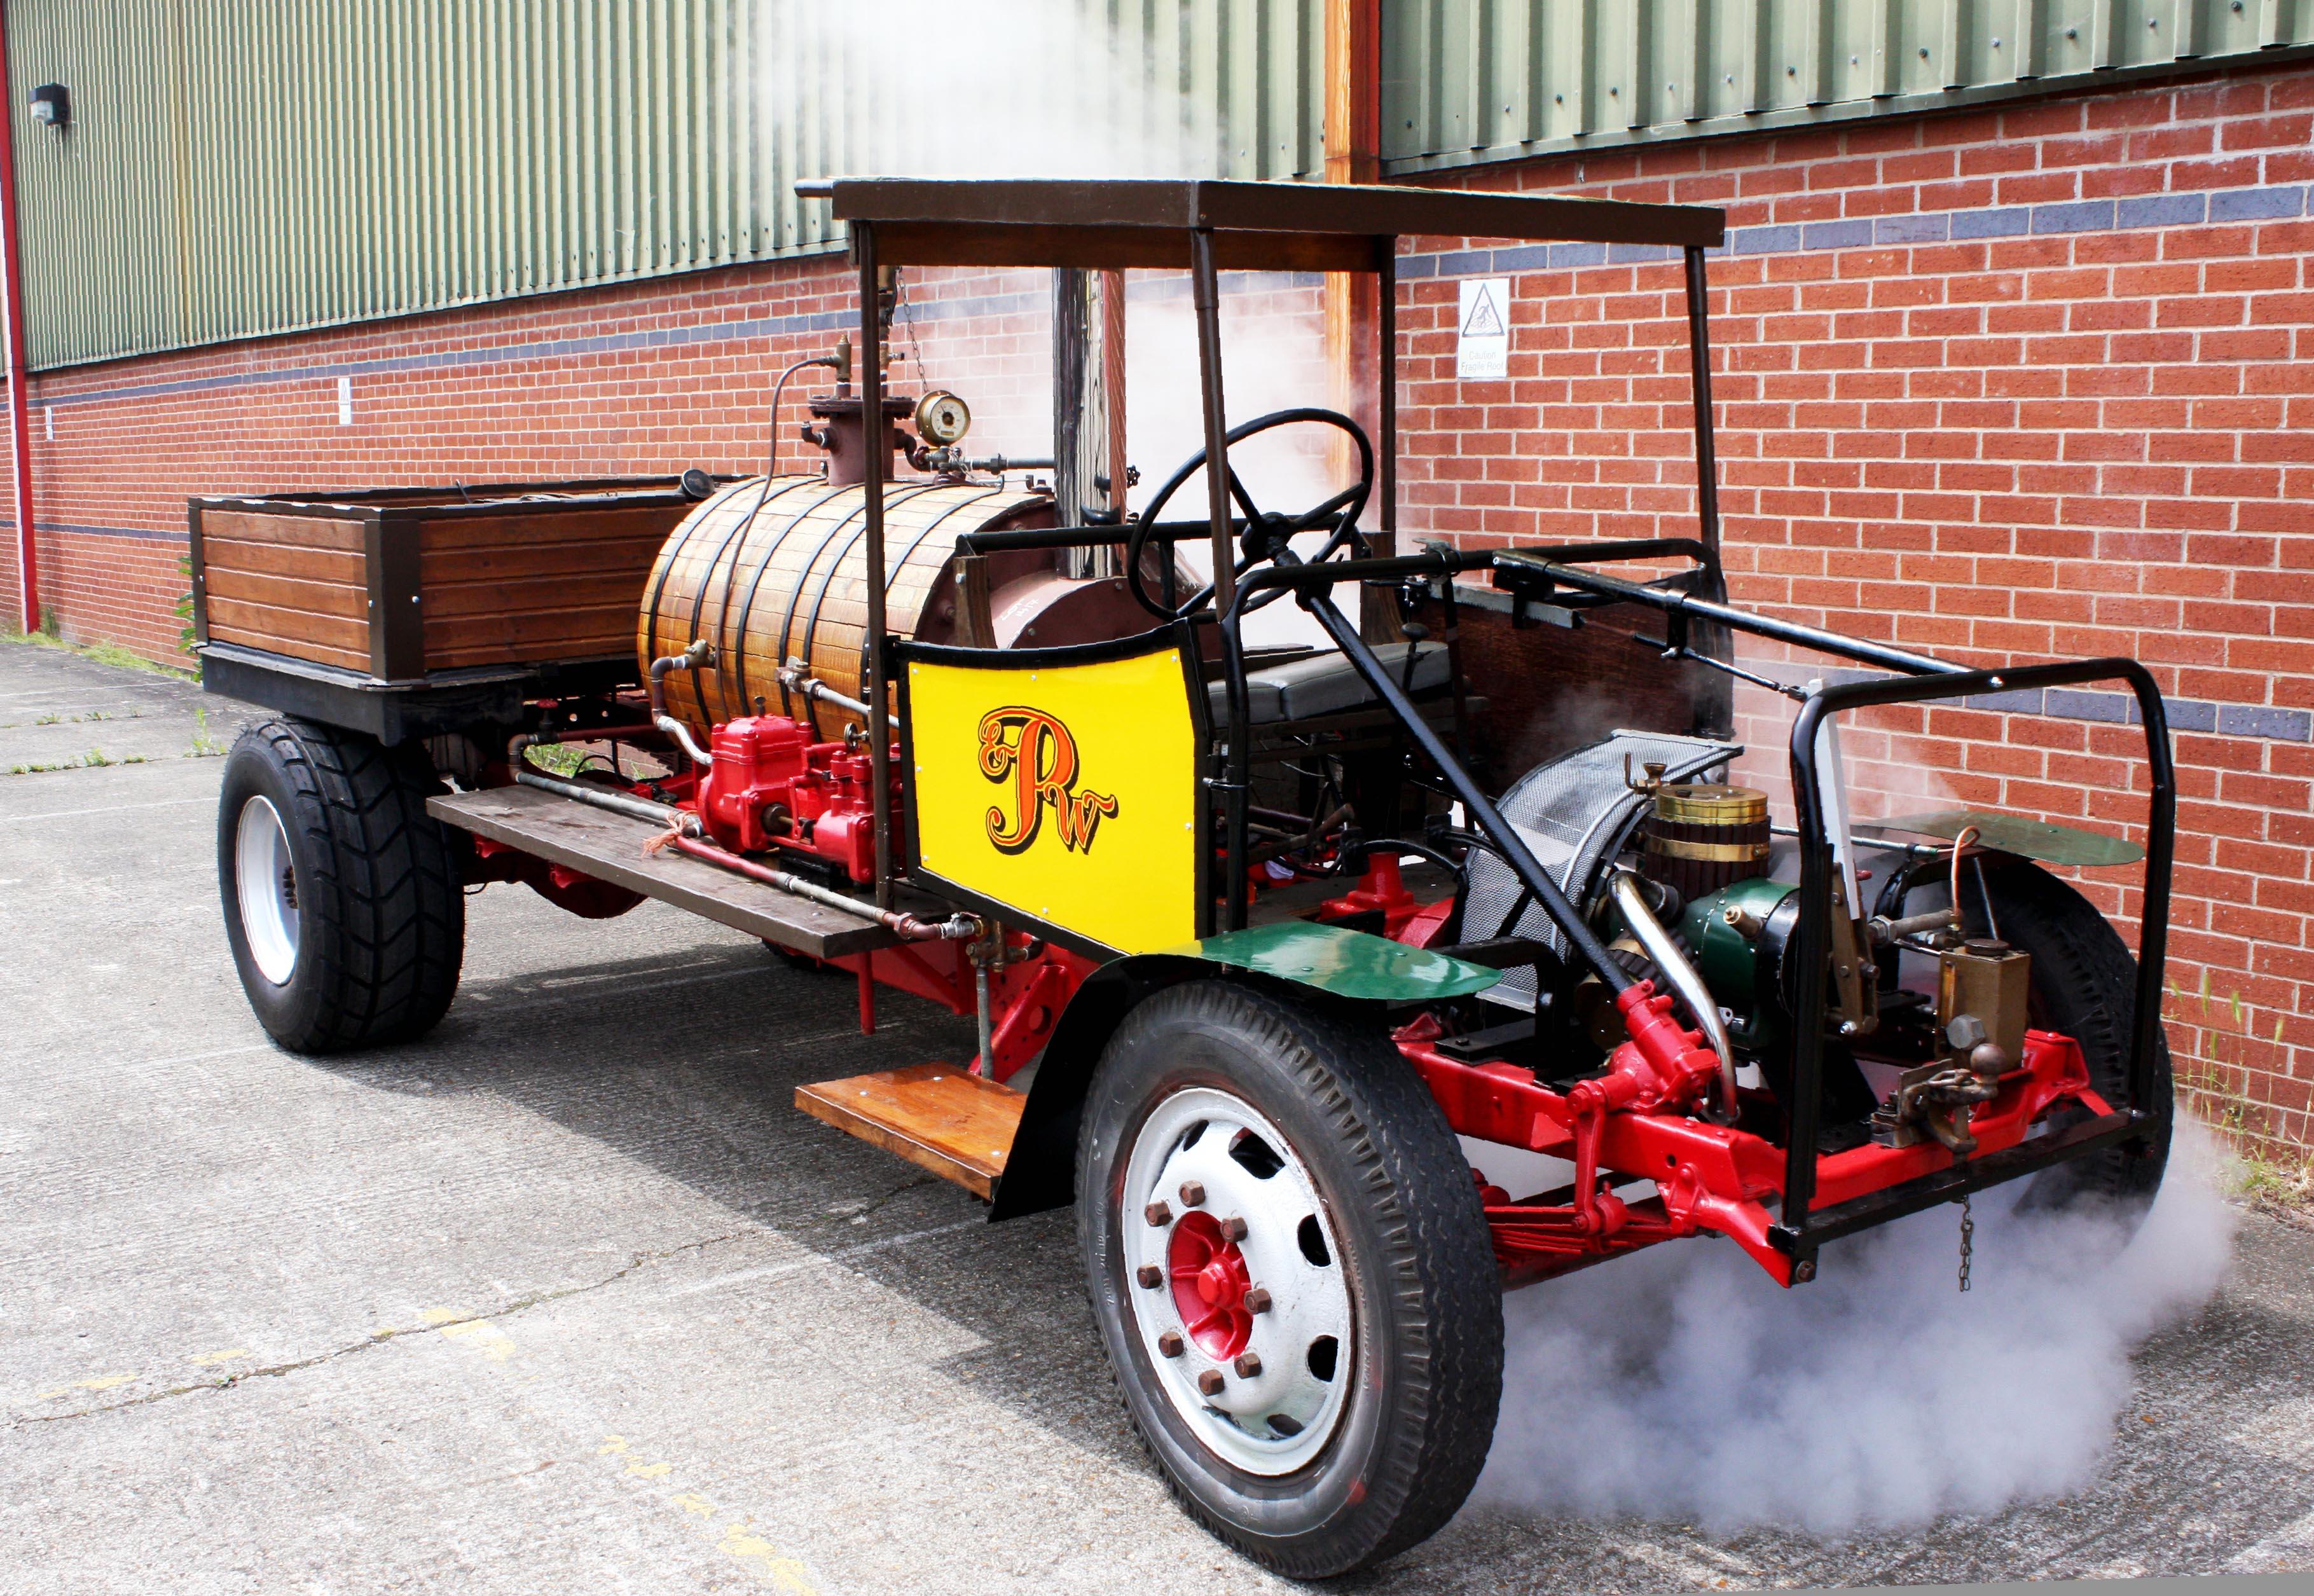 steam bespoke burner specialist applications